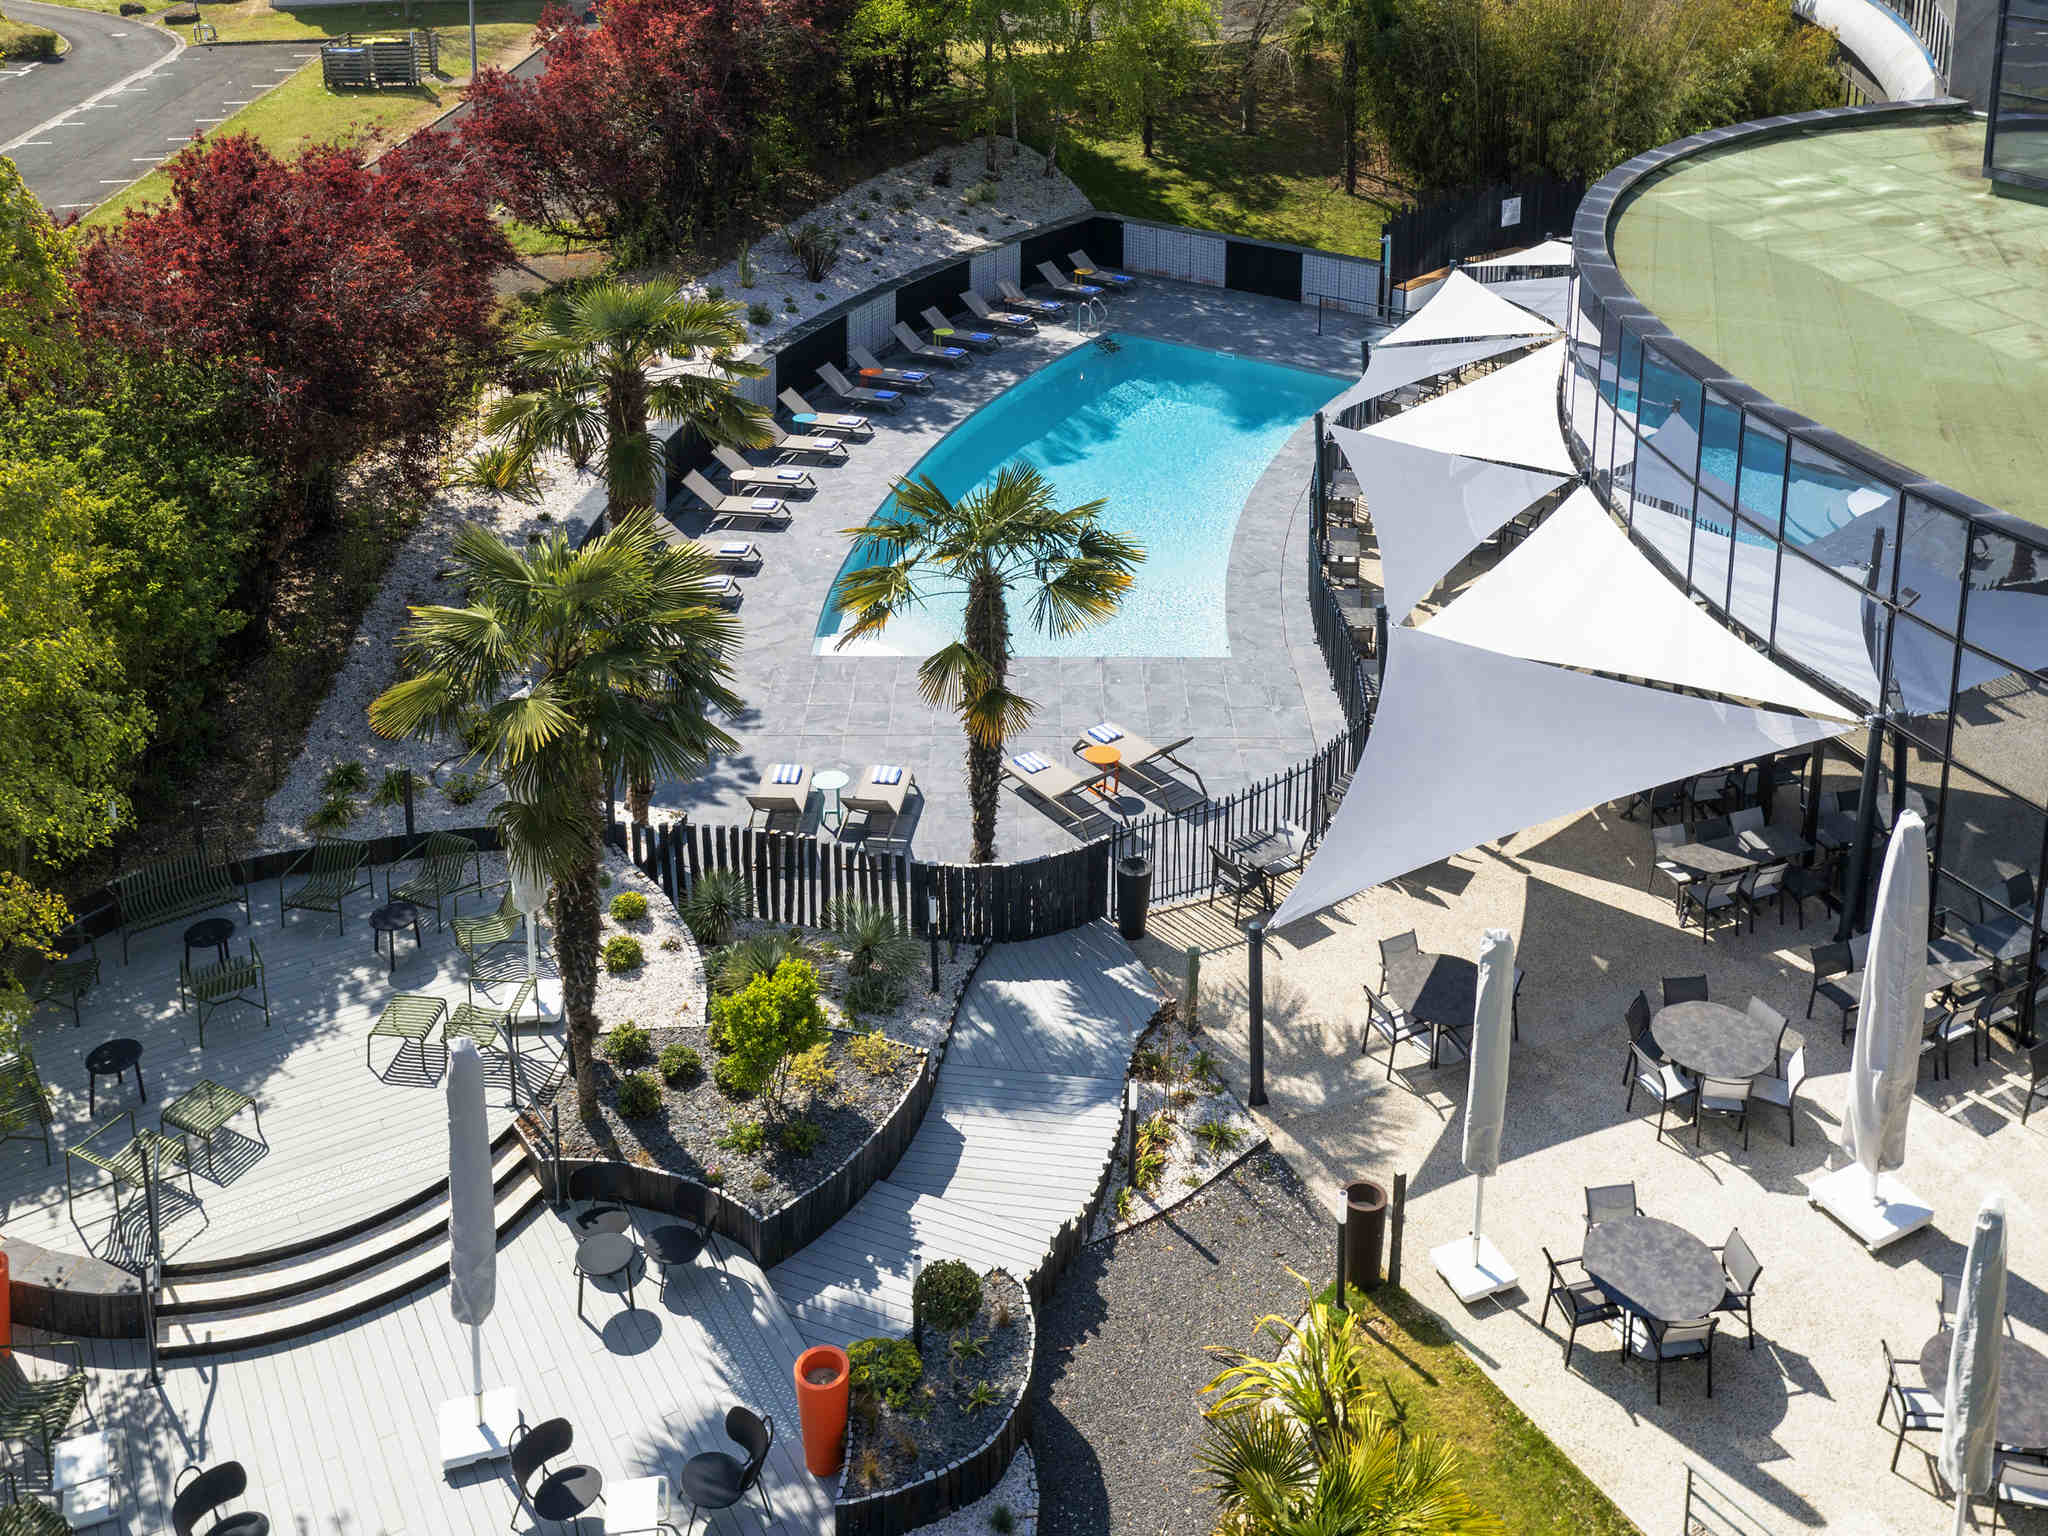 Hotell – Novotel Poitiers Site du Futuroscope